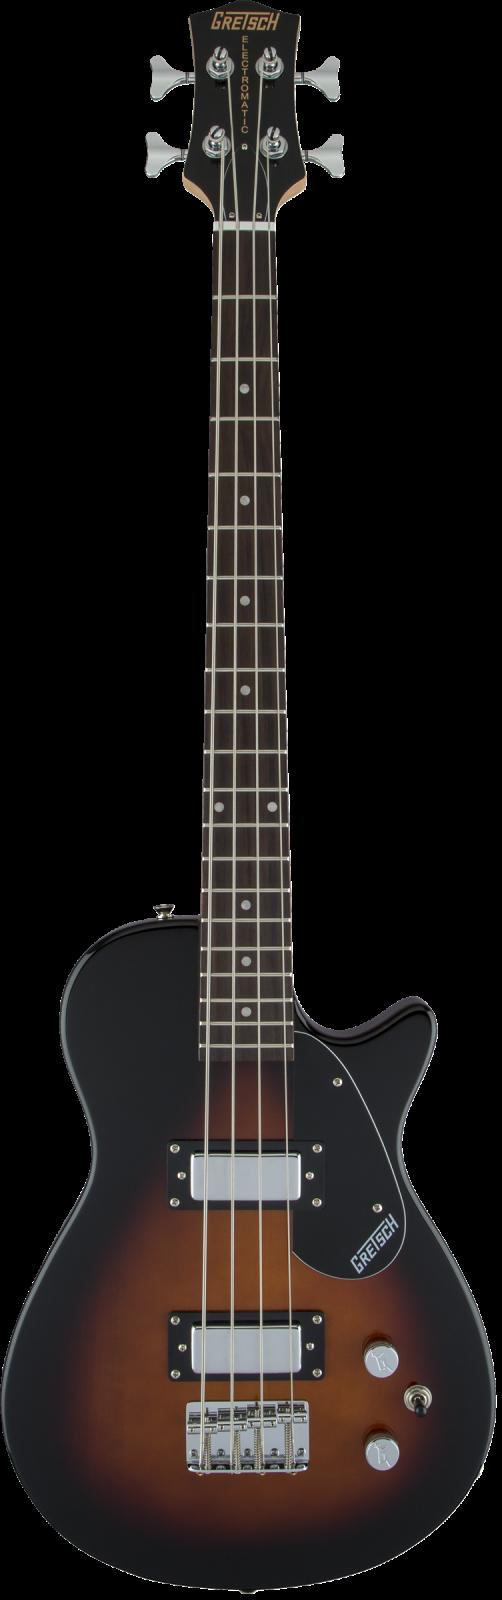 Gretsch  G2220 Electromatic Junior Jet Bass II - Tobacco Sunburst